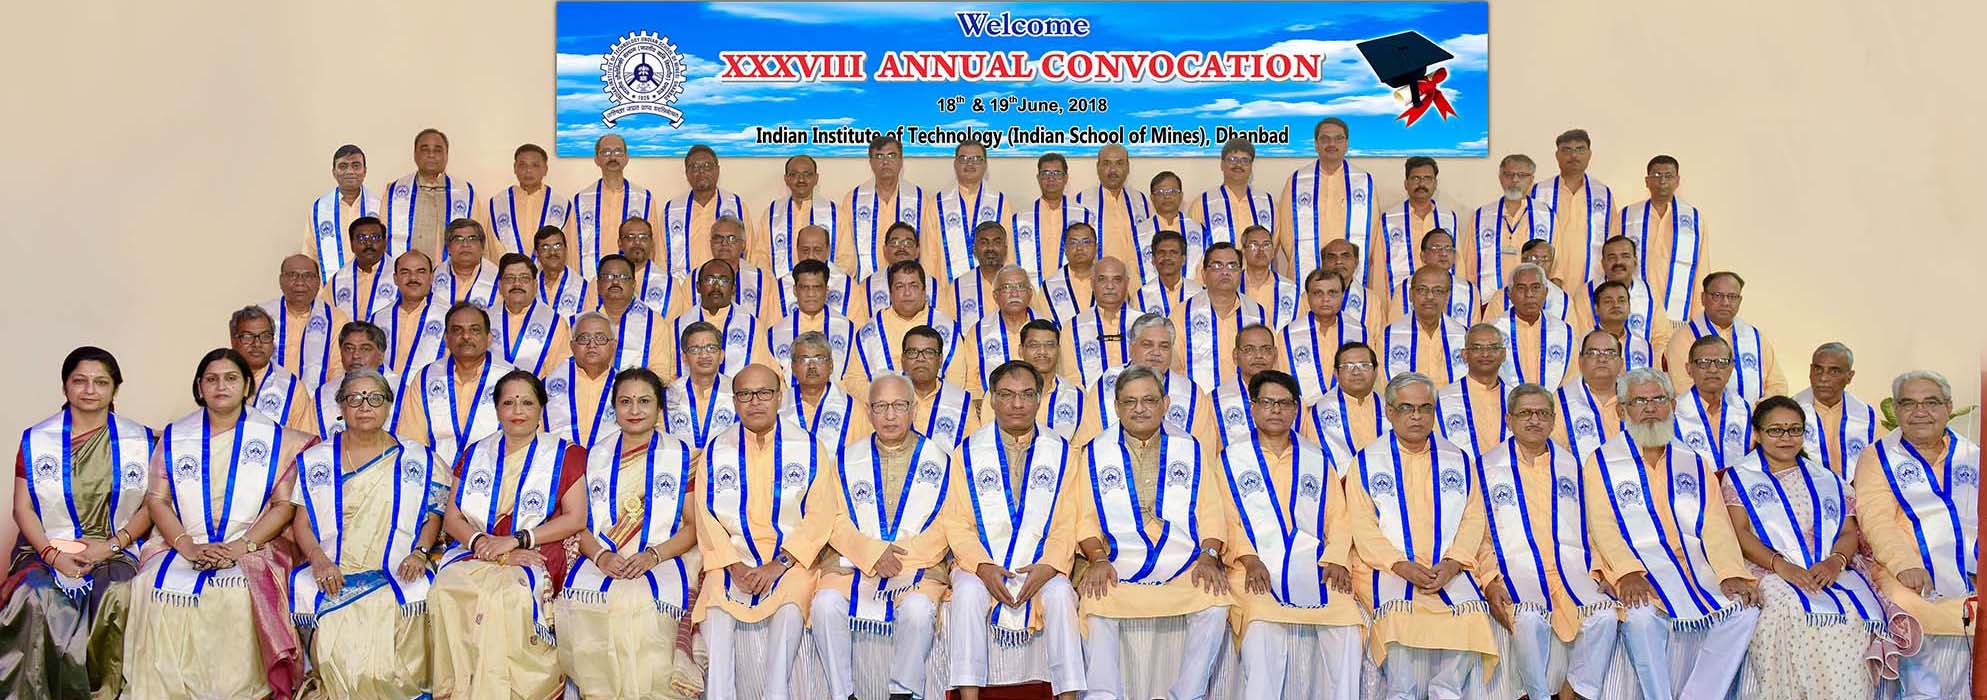 IIT (ISM) Dhanbad 2018 Convocation